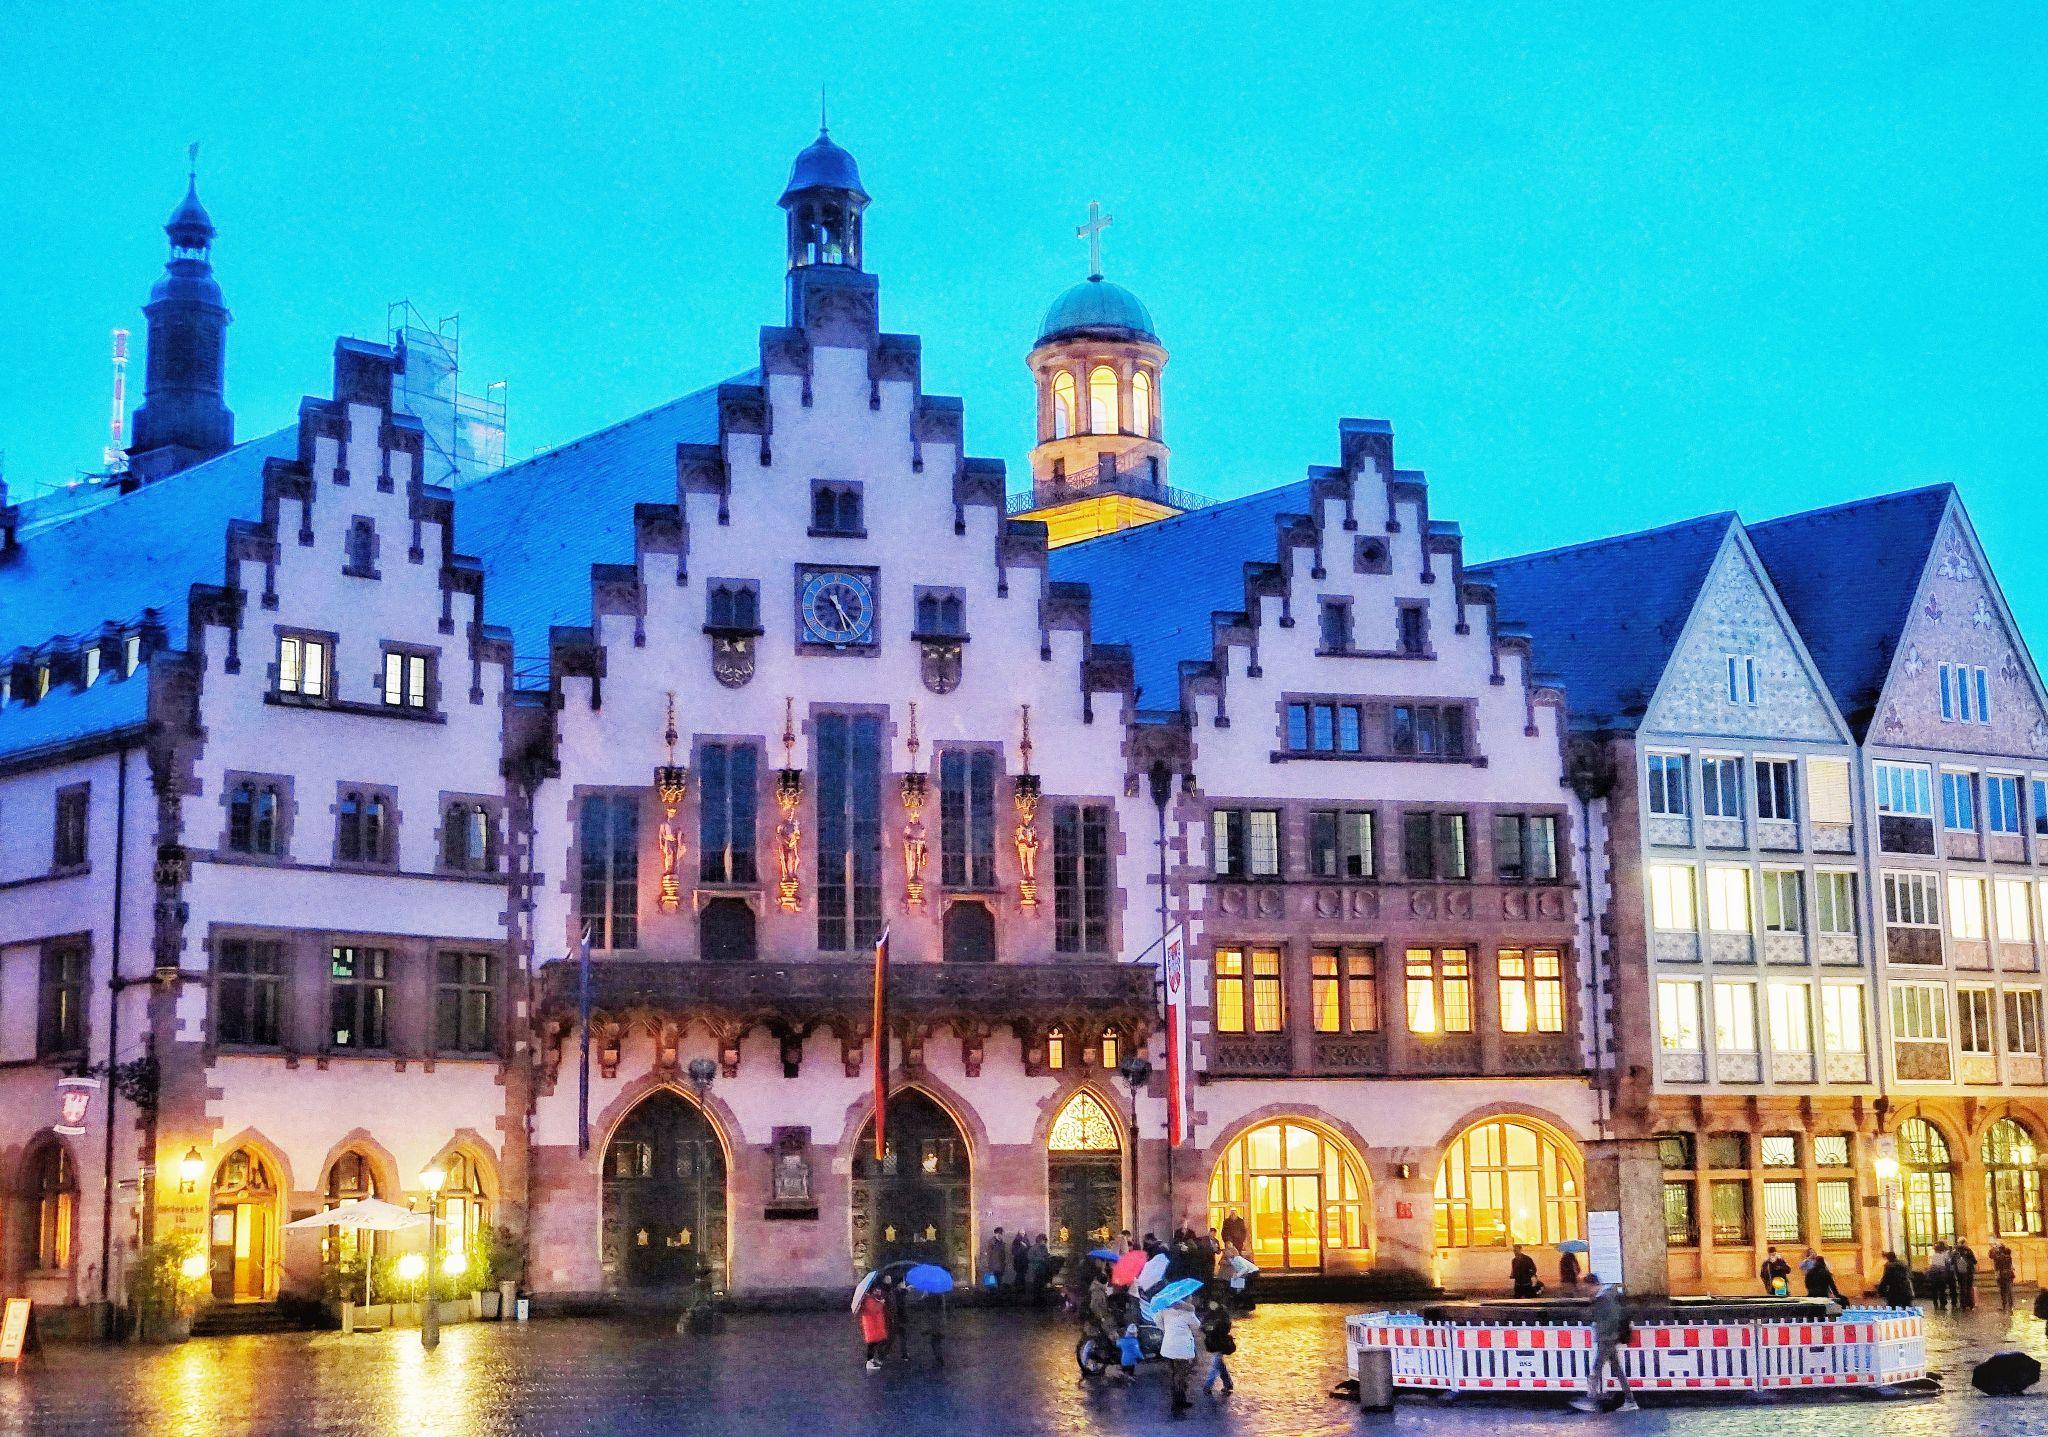 Historical Square of Frankfurt, Germany